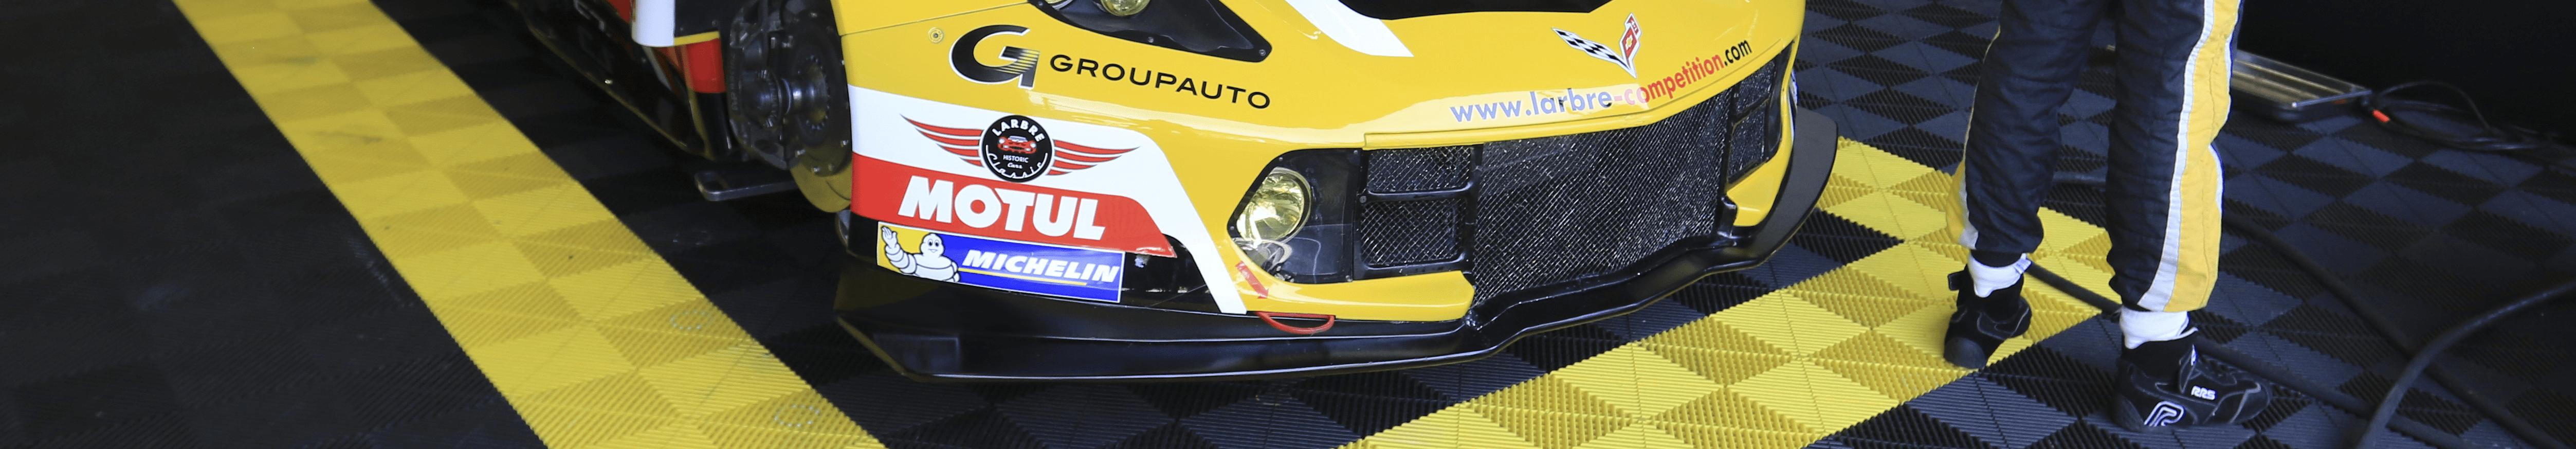 MOTORSPORT : FIA WEC - 6 HOURS OF SPA FRANCORCHAMPS (BEL) - ROUND 2 05/5-7/2016